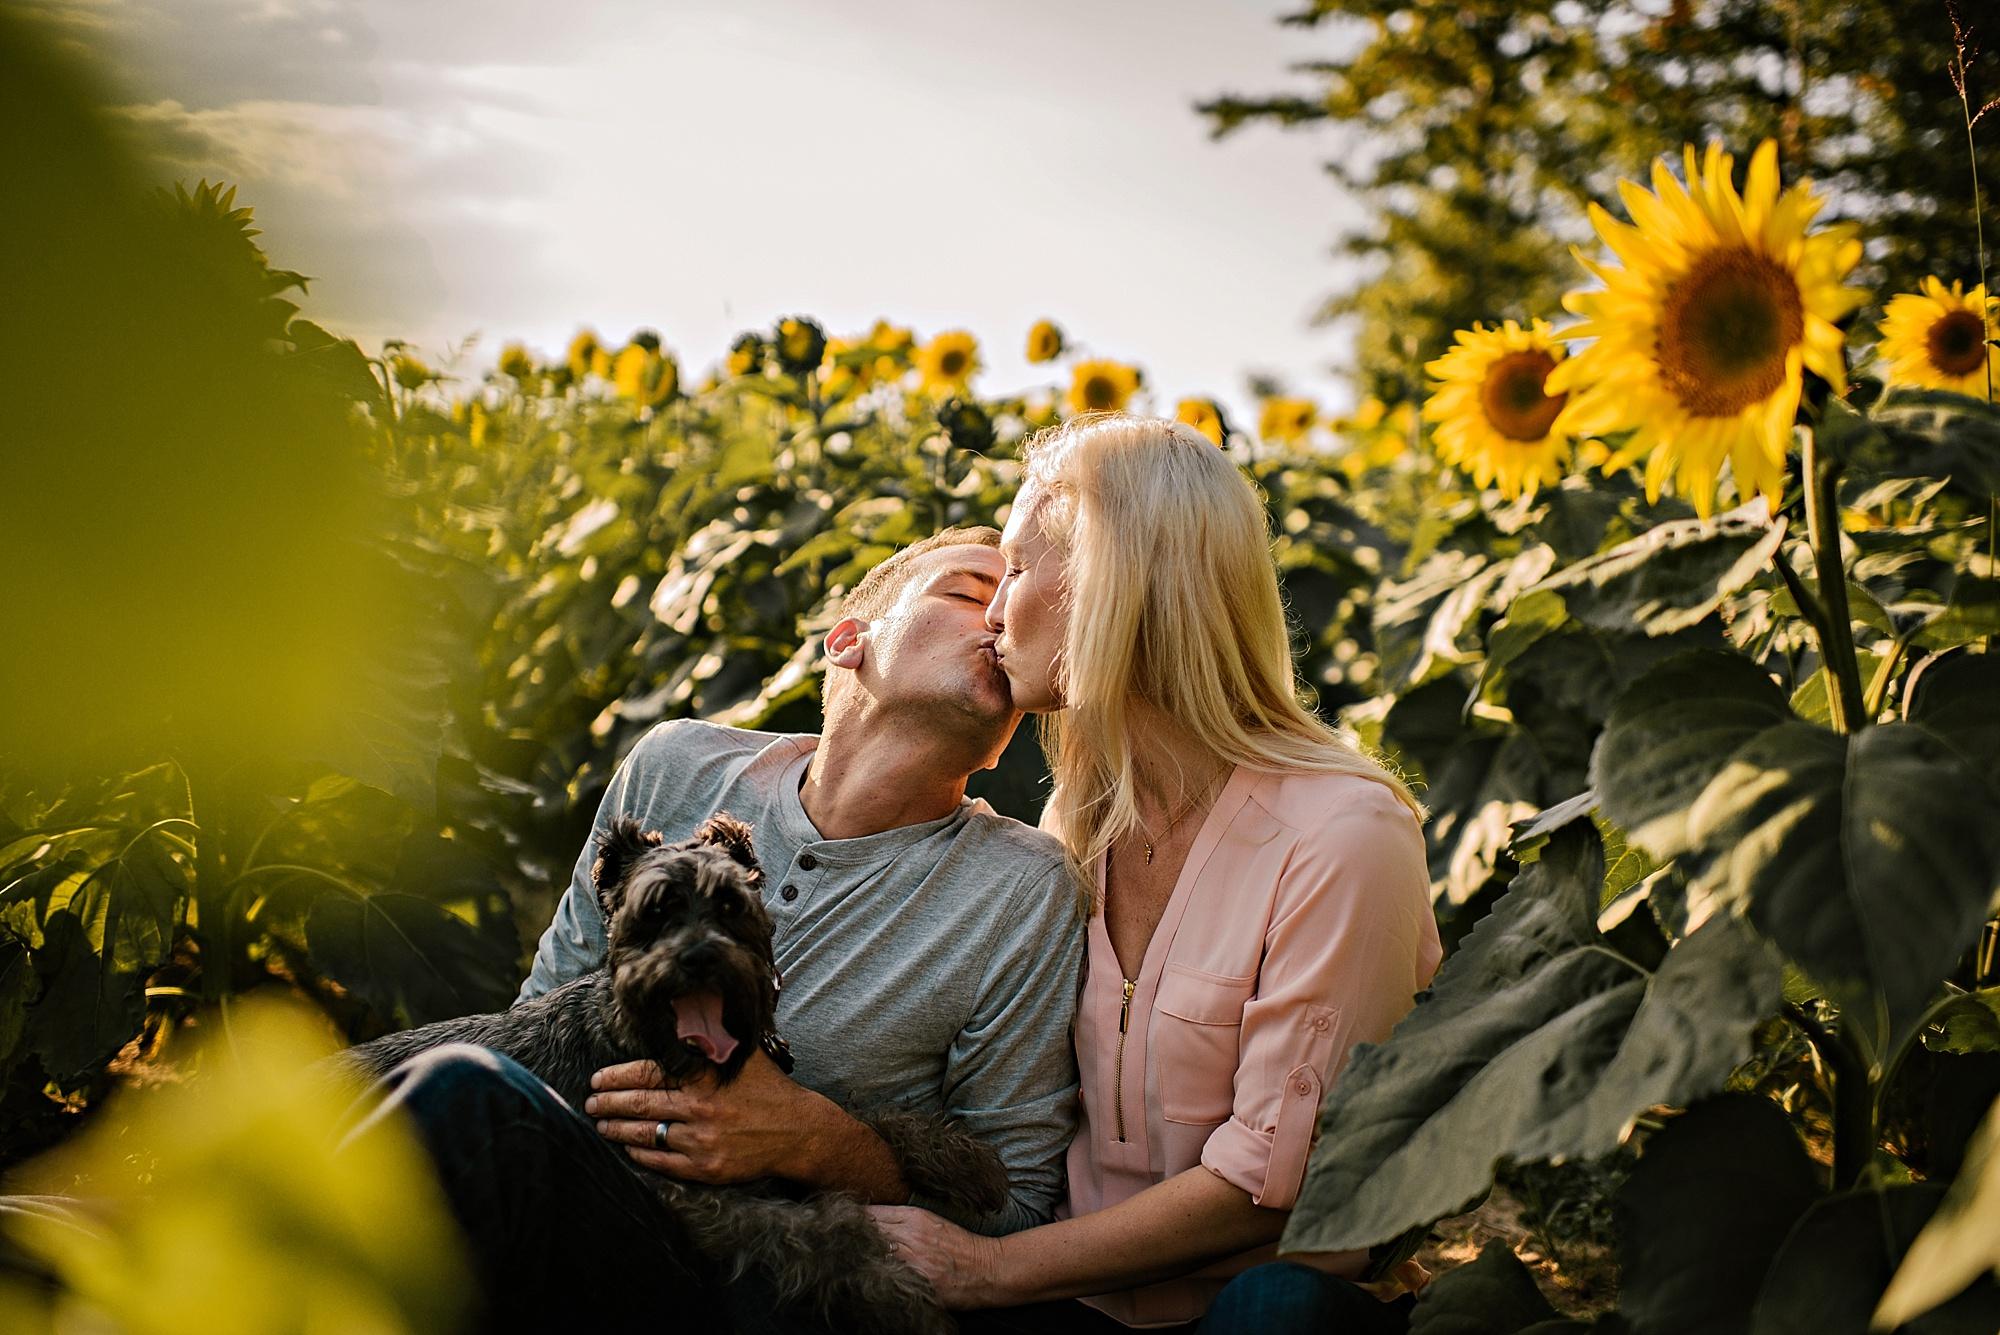 Lori-and-mike-akron-ohio-photographer-lauren-grayson-sunflower-field-session_0021.jpg